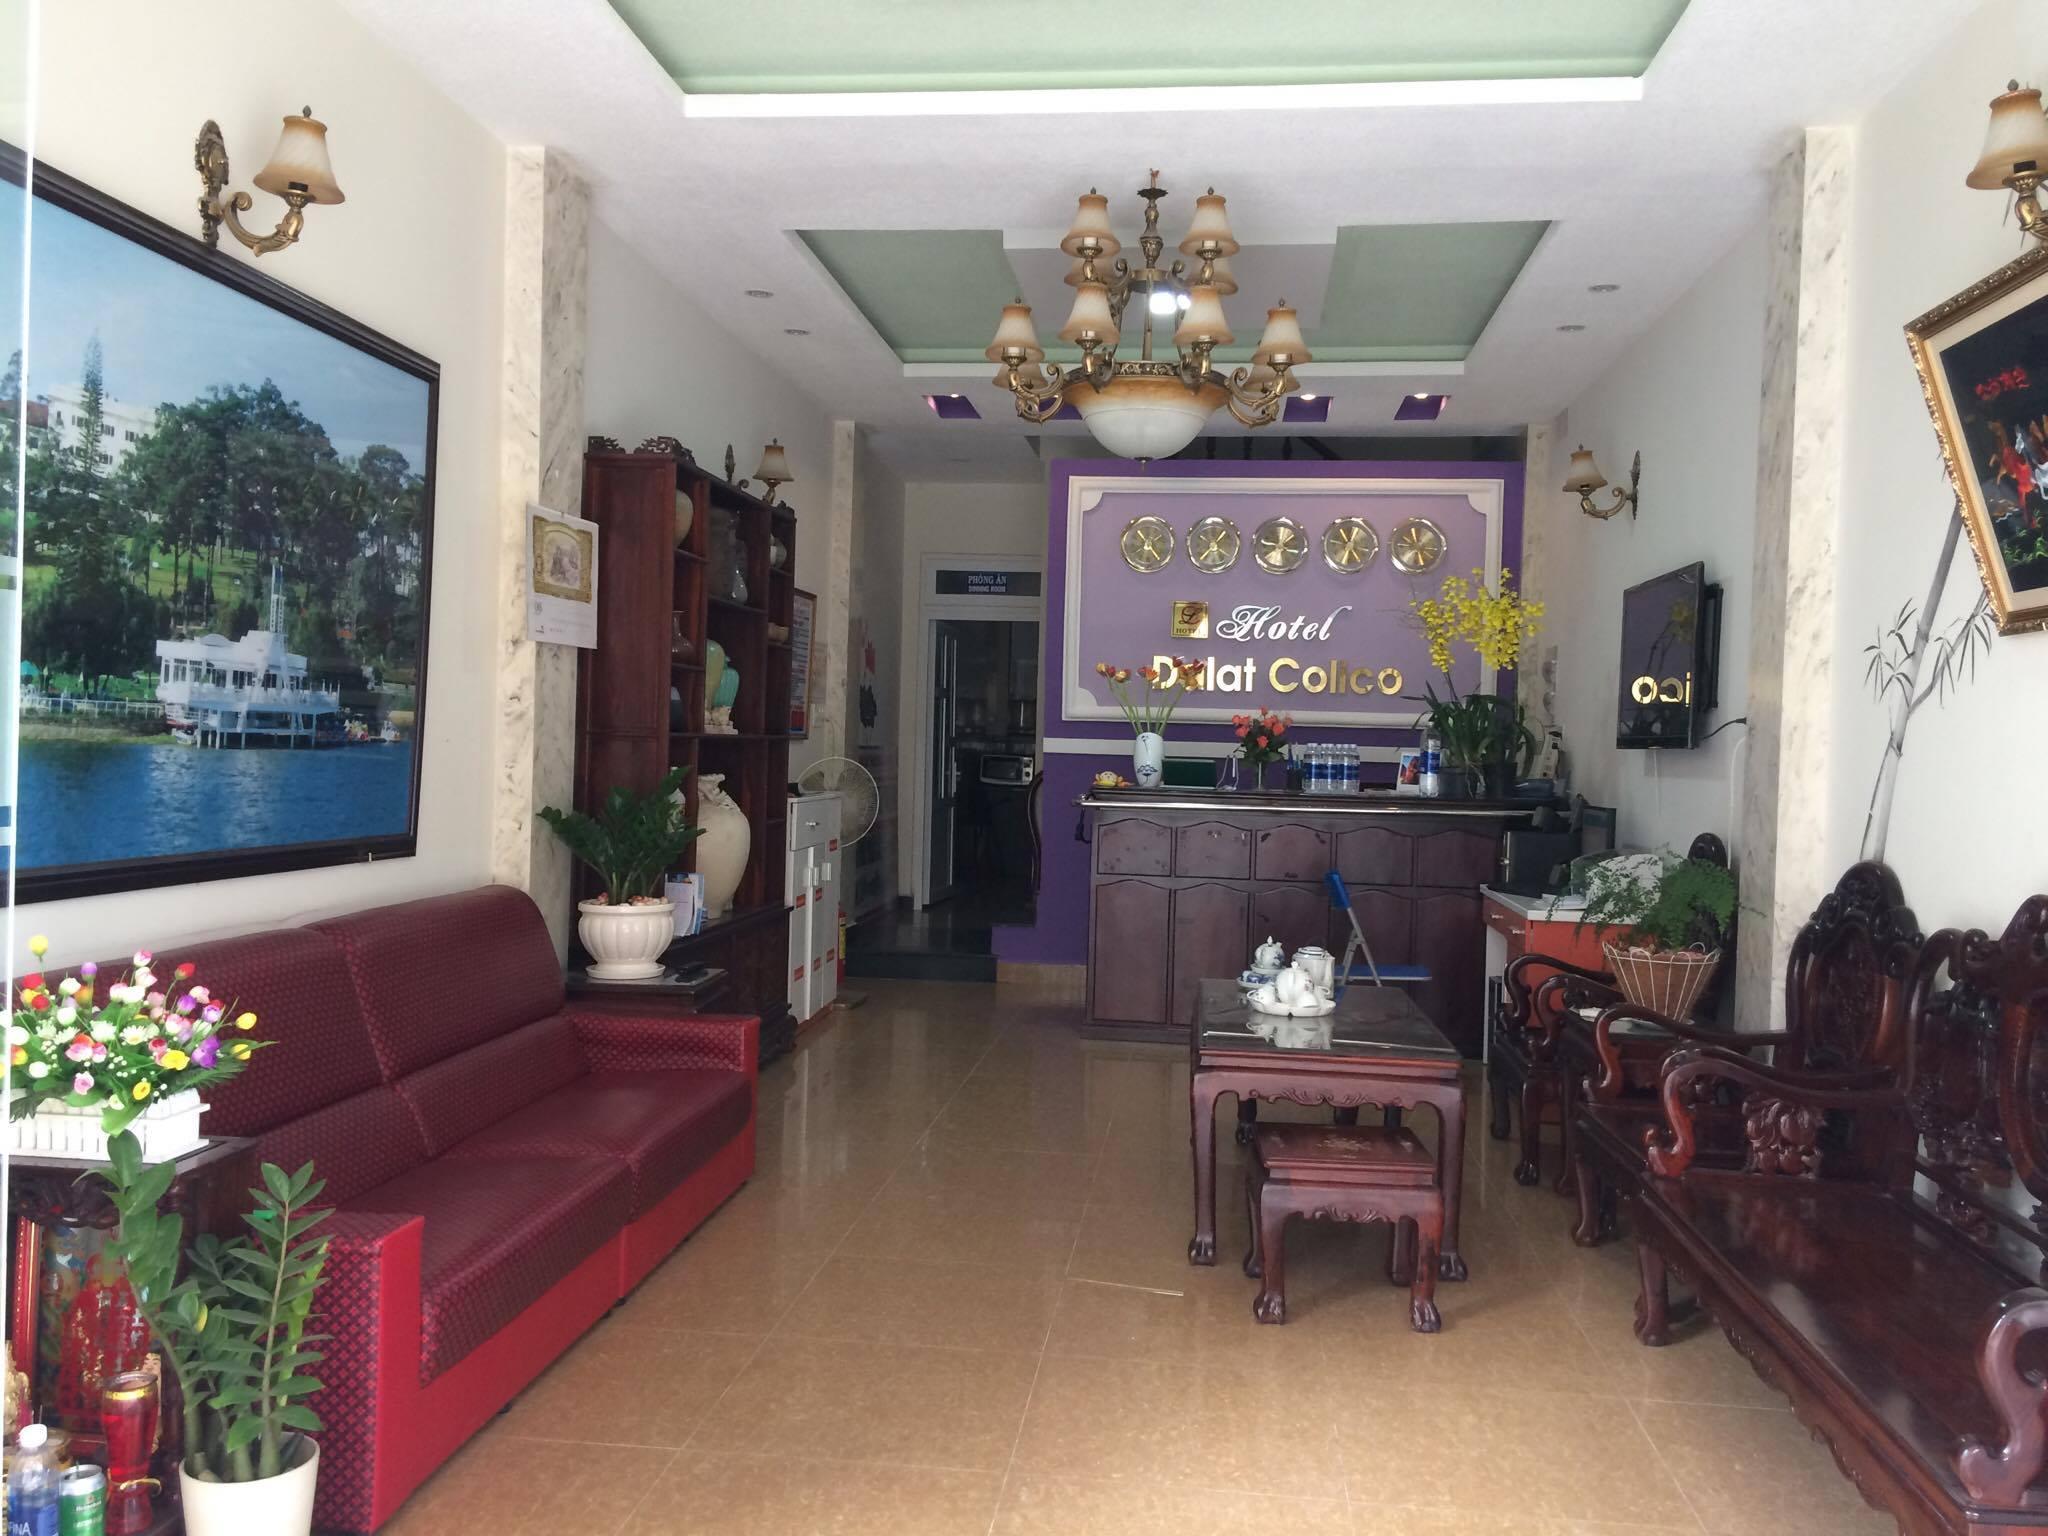 Dalat Colico Hotel